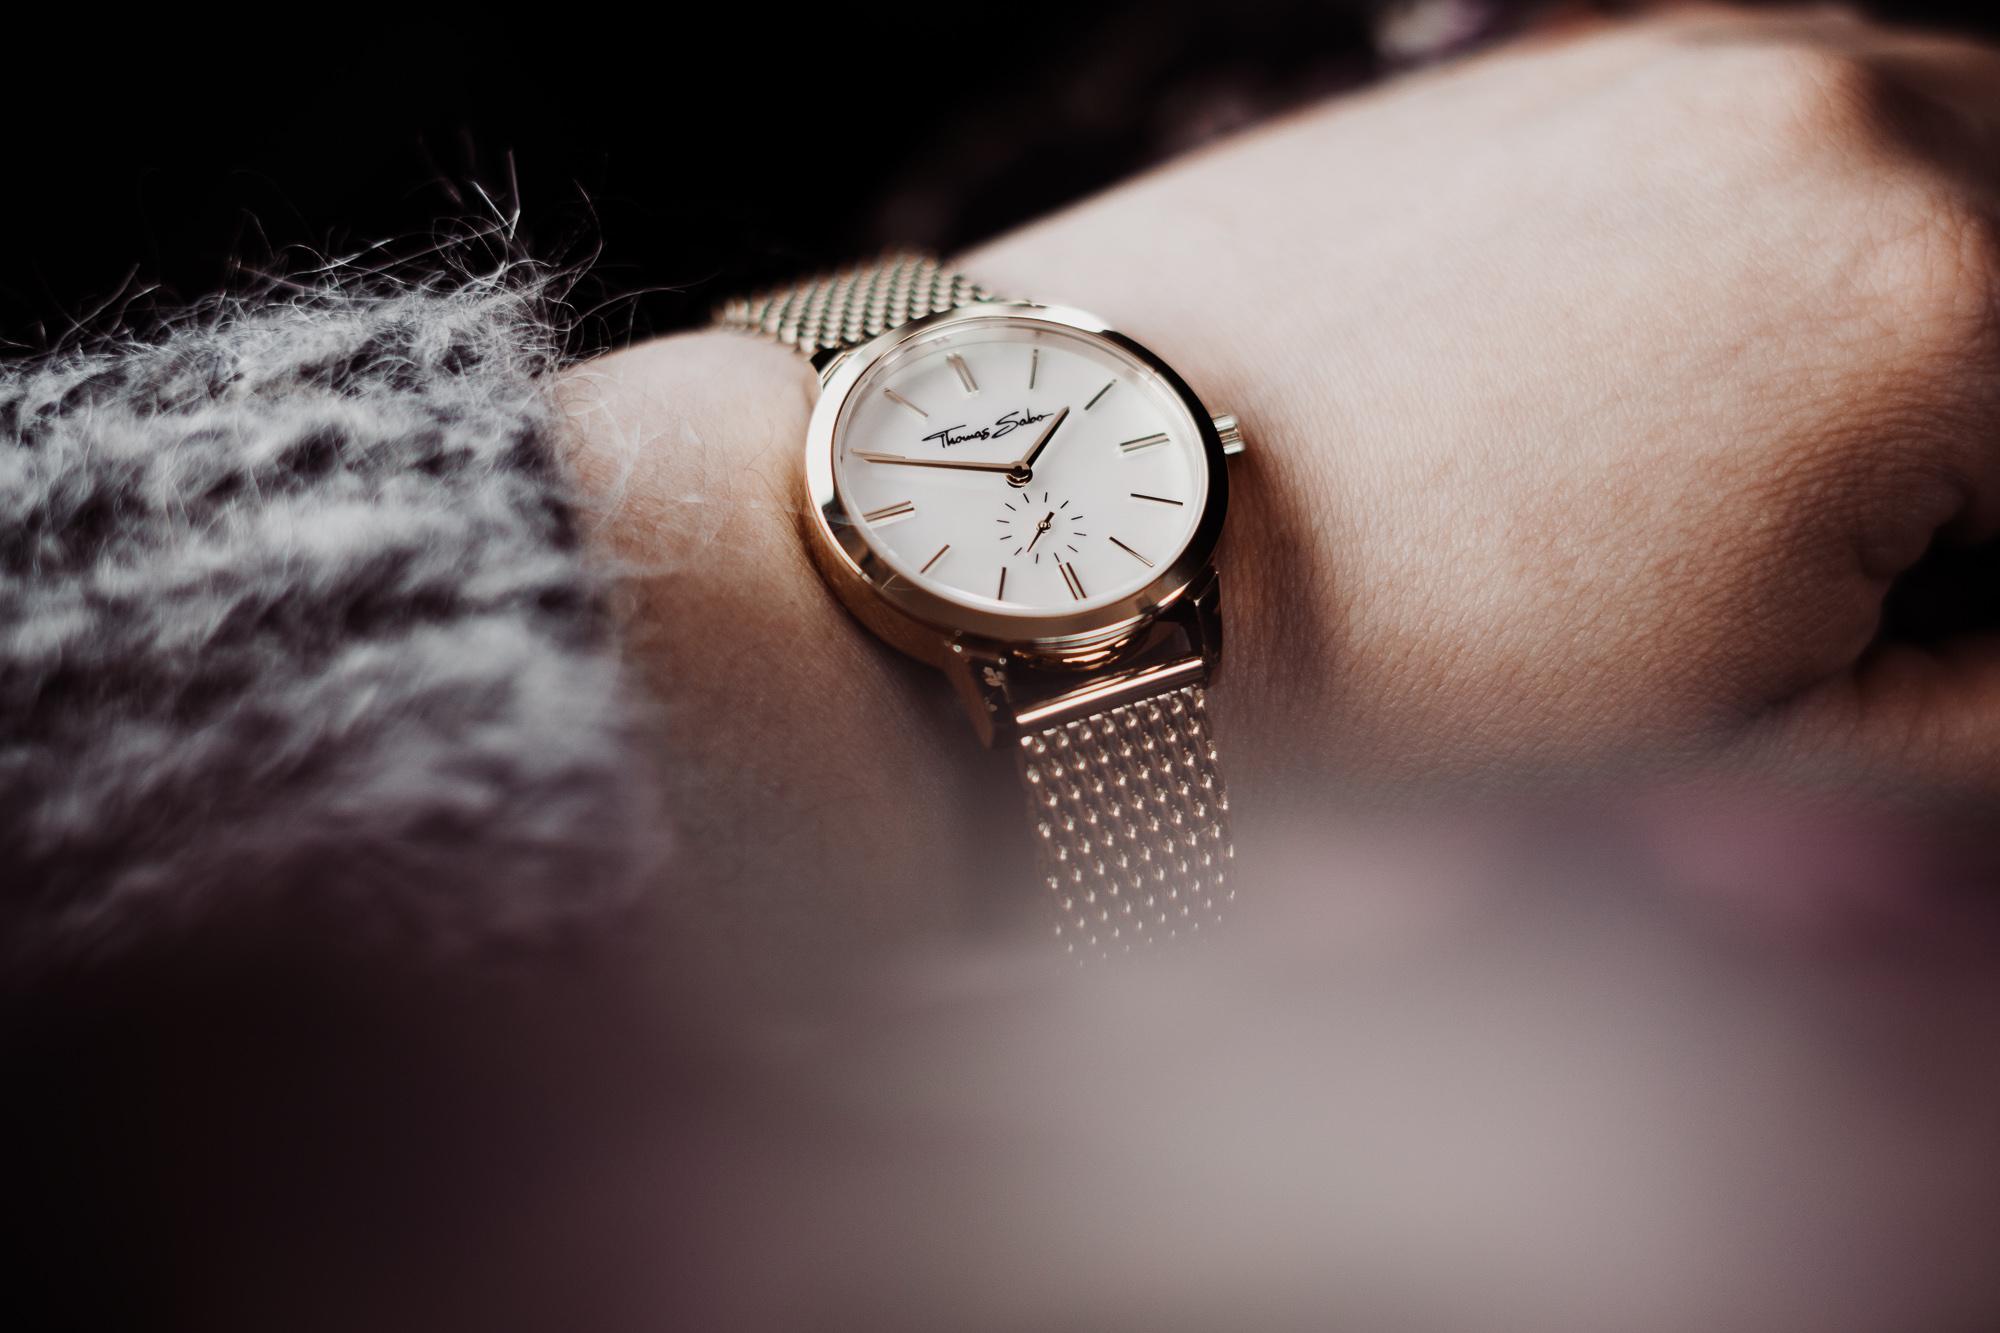 ketten-layering-trend-thomas-sabo-modeblog-infatstyle-fashionblog-plussize-blog-schmuck-trend-oktober-2018-gold-ketten-outfit-uhr-ring